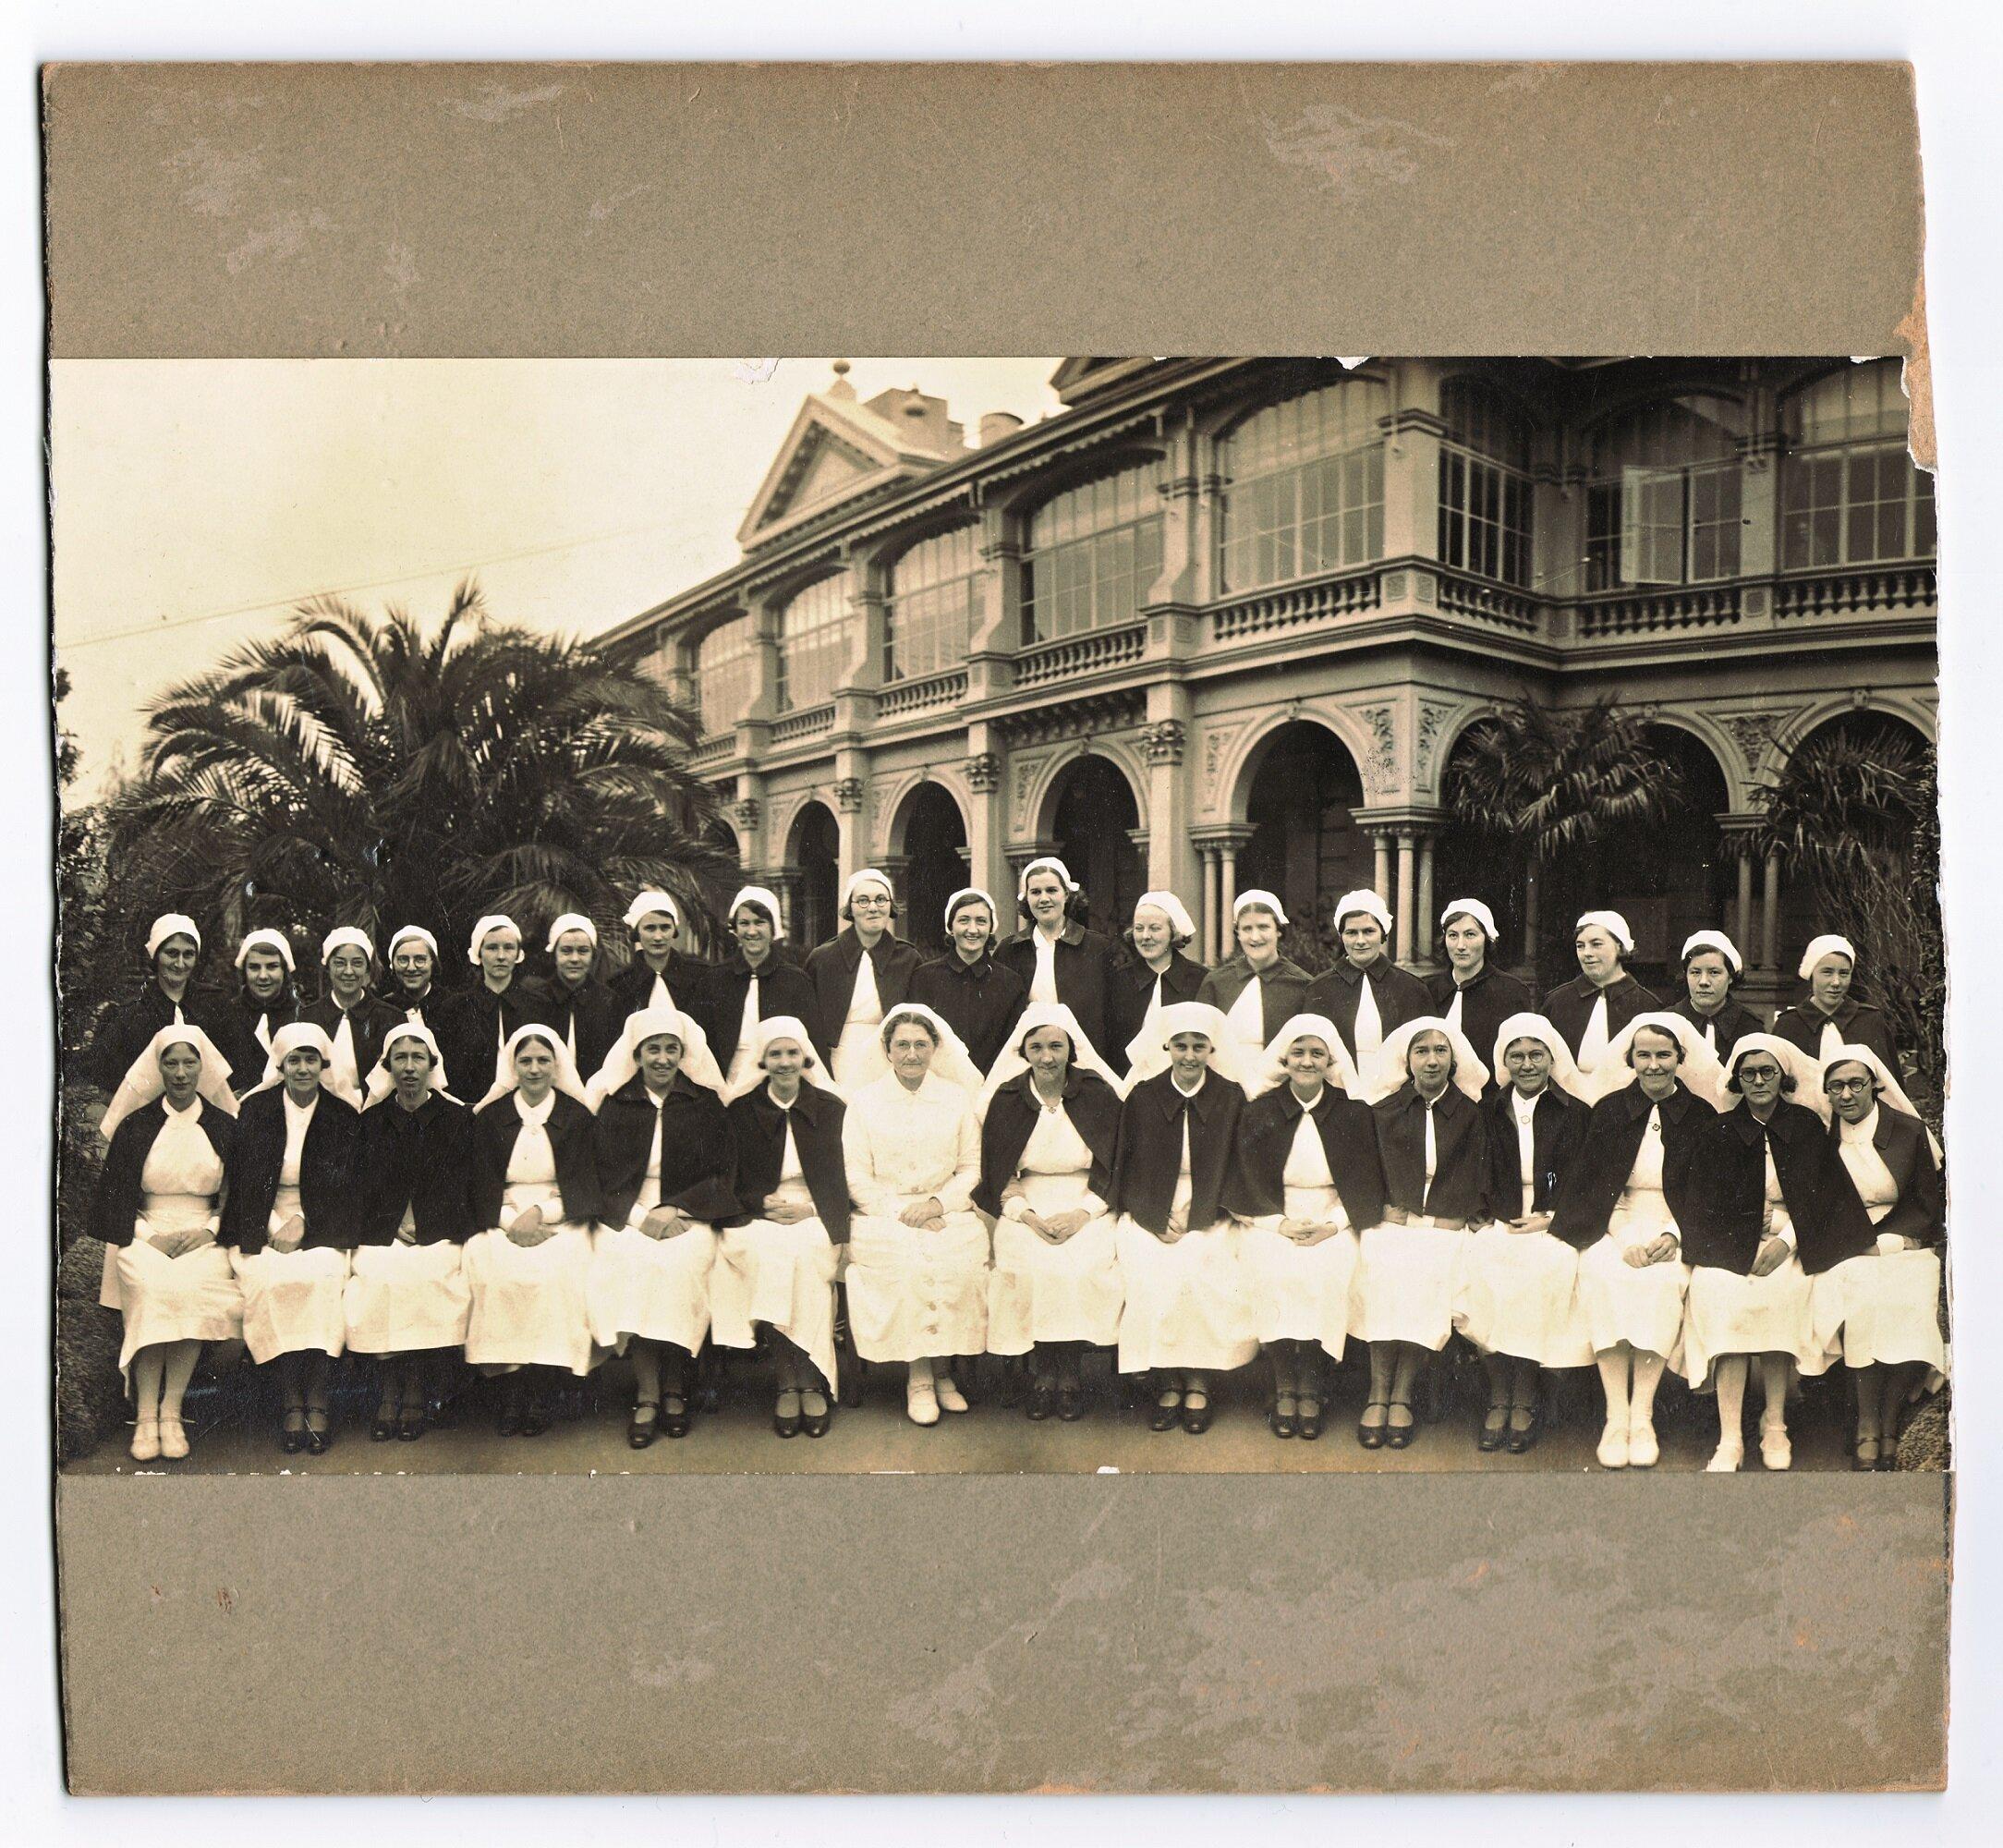 Nursing over 100 years